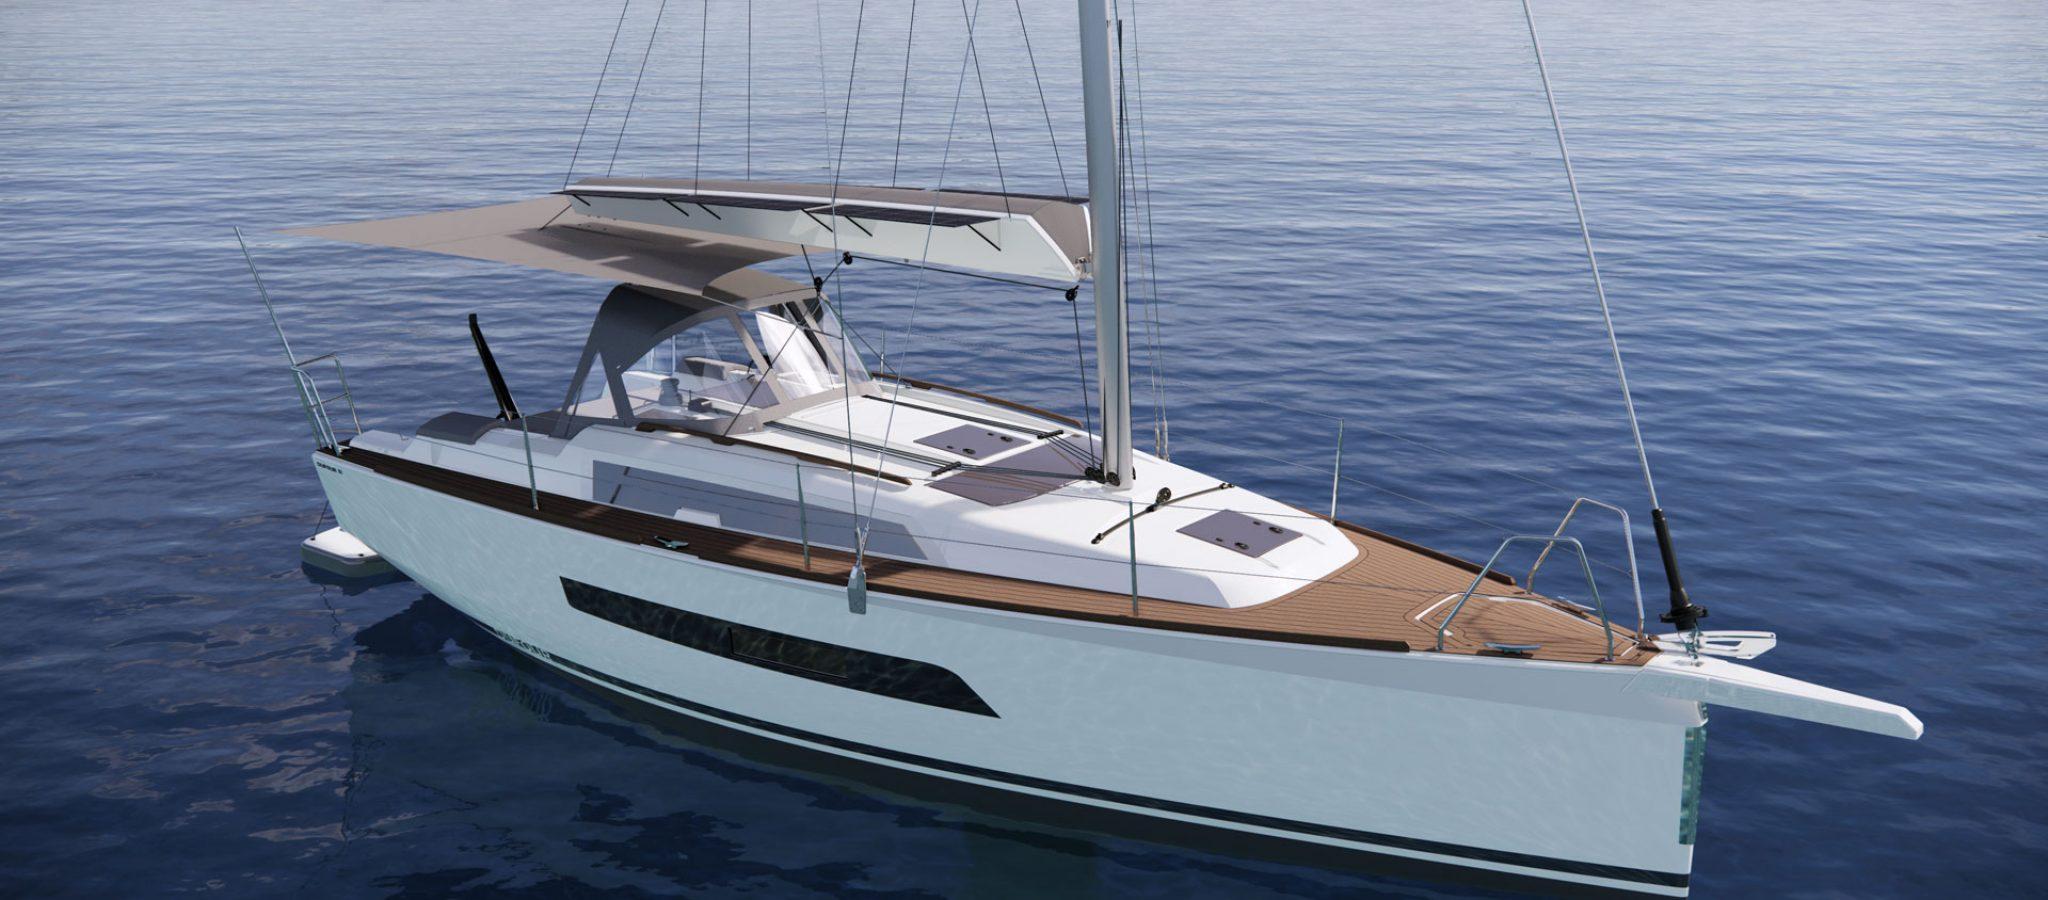 dufour-32-sailing-yacht-luxury-2